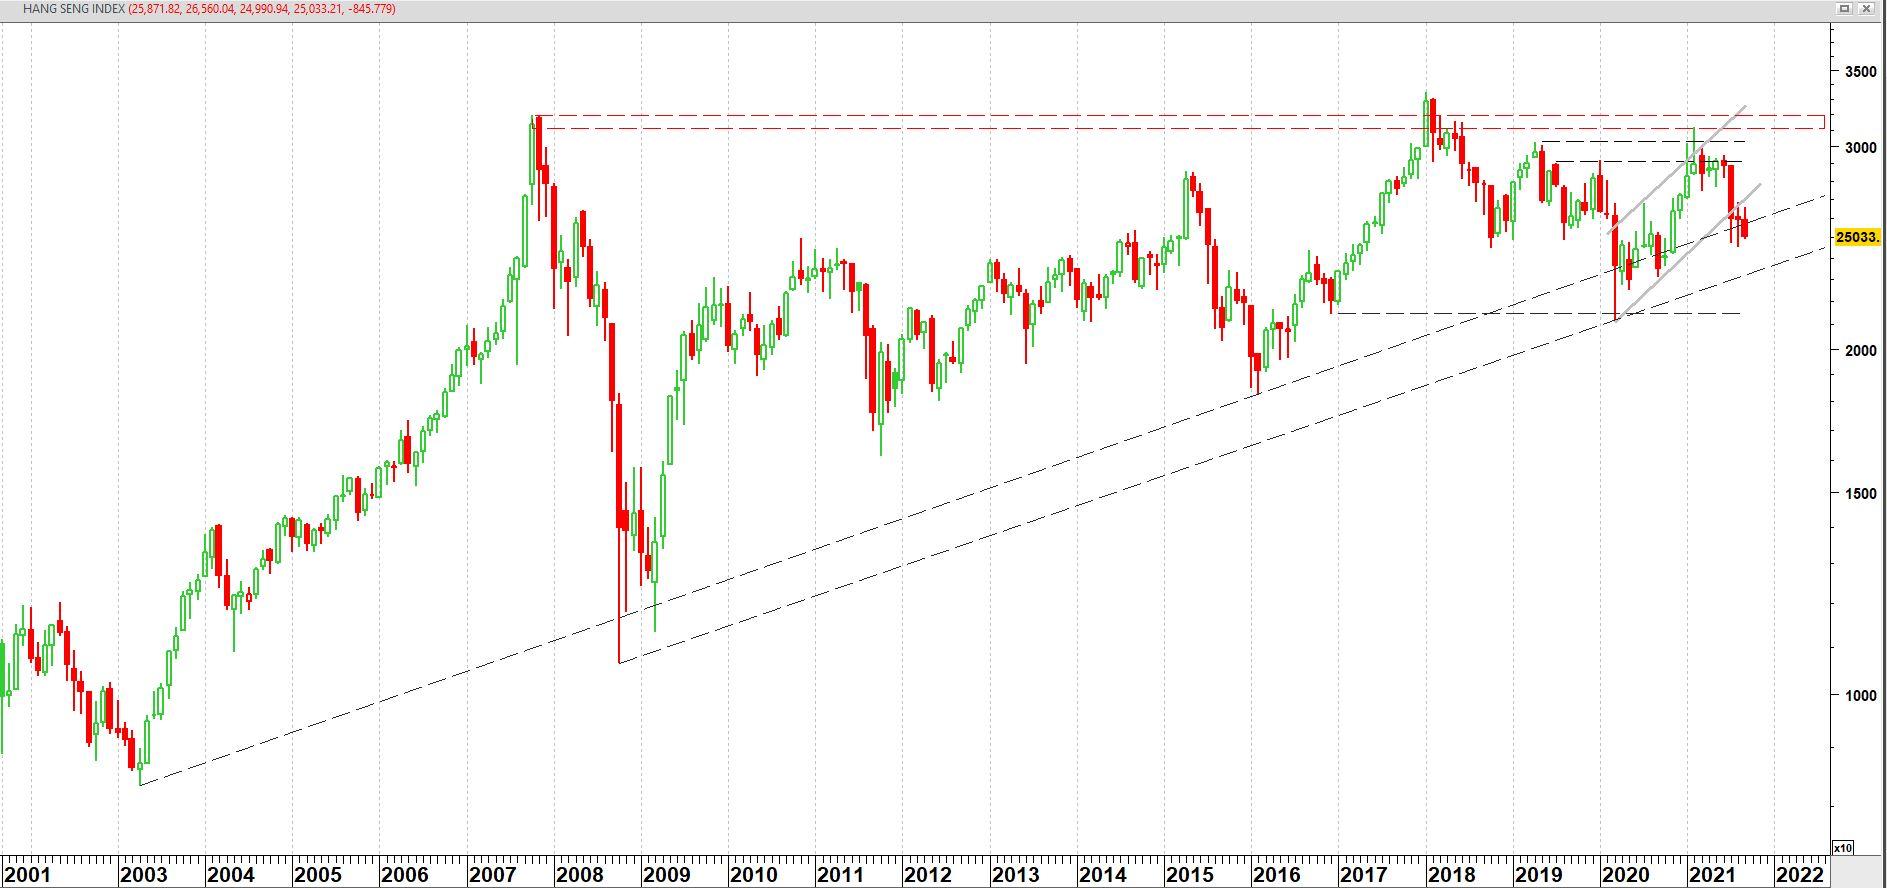 Hang Seng Index op maandbasis vanaf september 2001